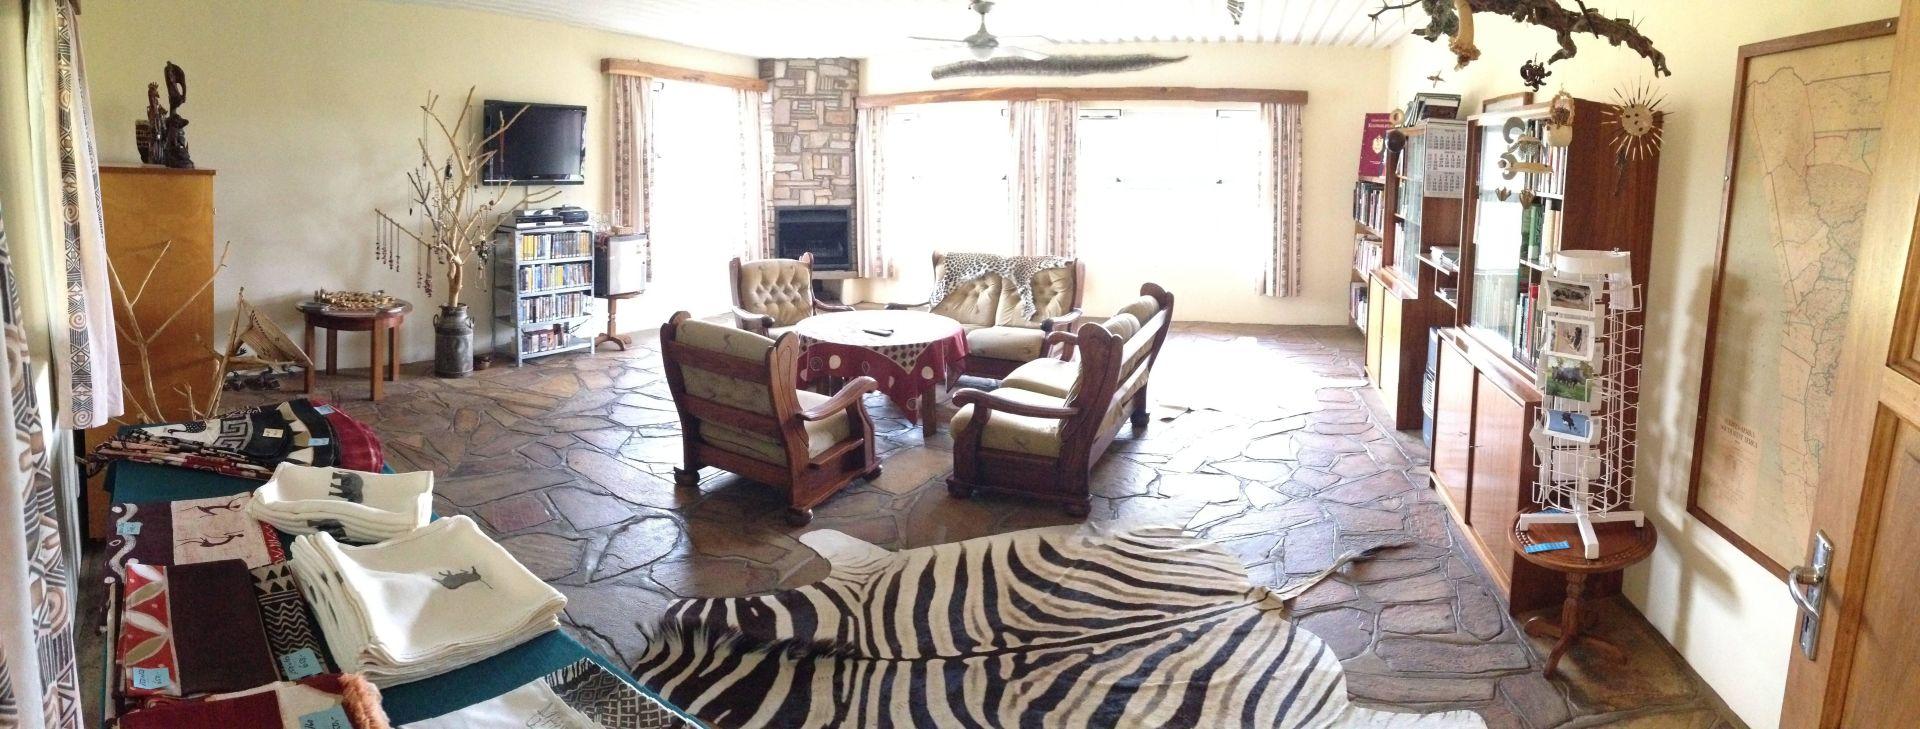 Gästefarm Archive | Dornhügel Gästefarm Namibia